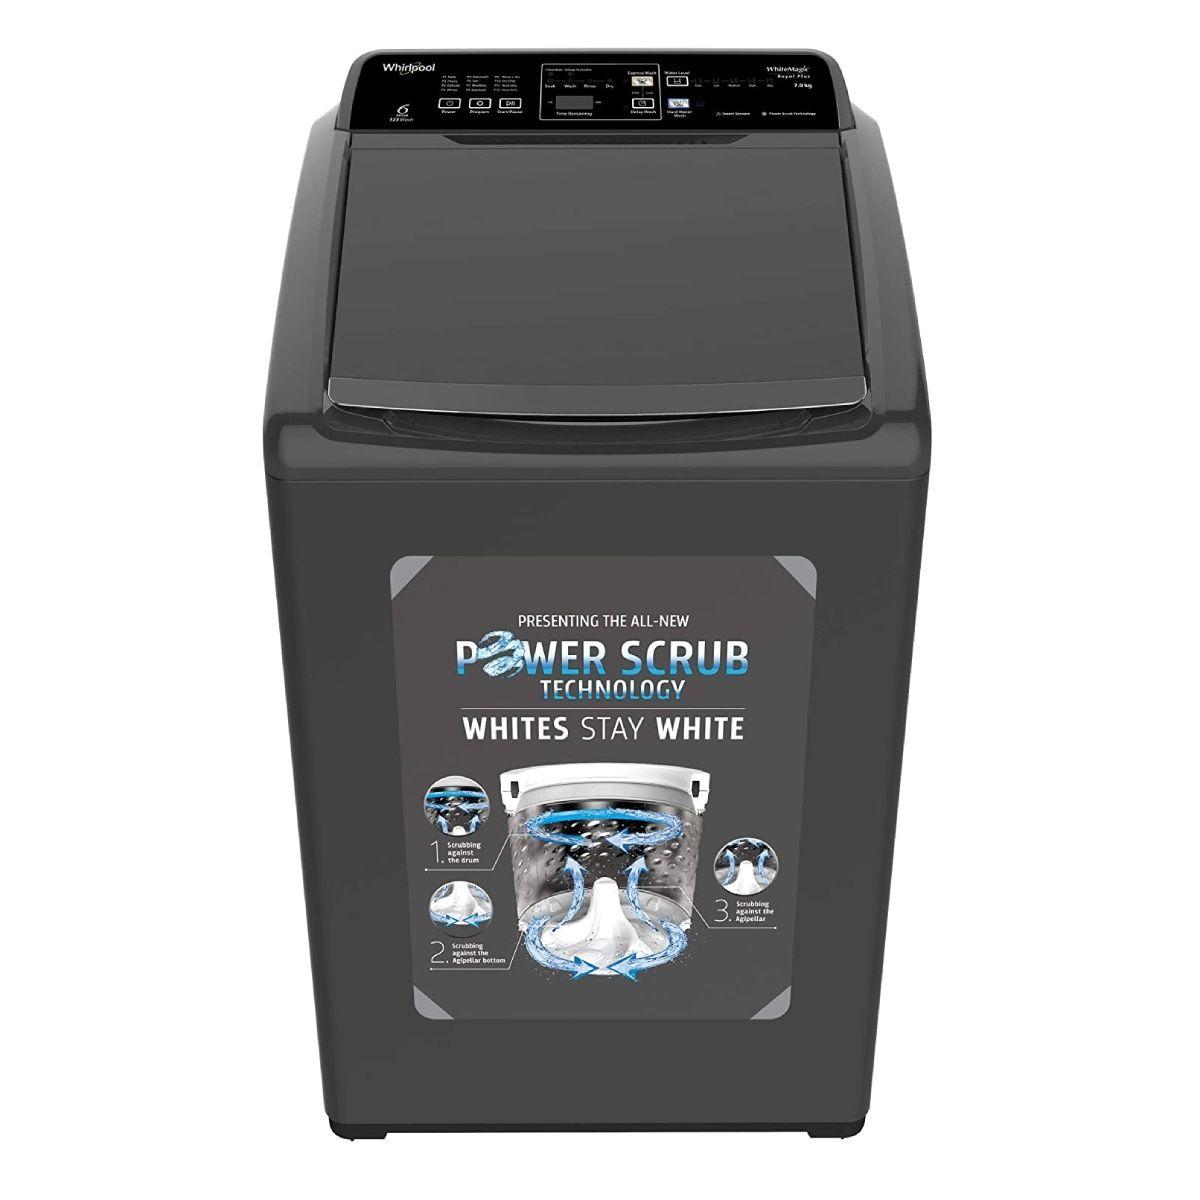 Whirlpool 7 kg Fully-Automatic Top Loading Washing Machine (WM Royal Plus 7.0 5YMW)